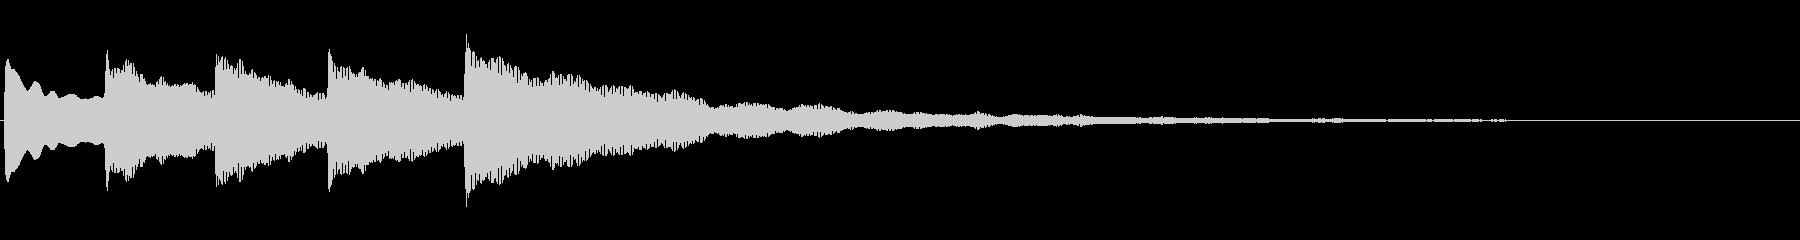 Bell-ジングル_04の未再生の波形